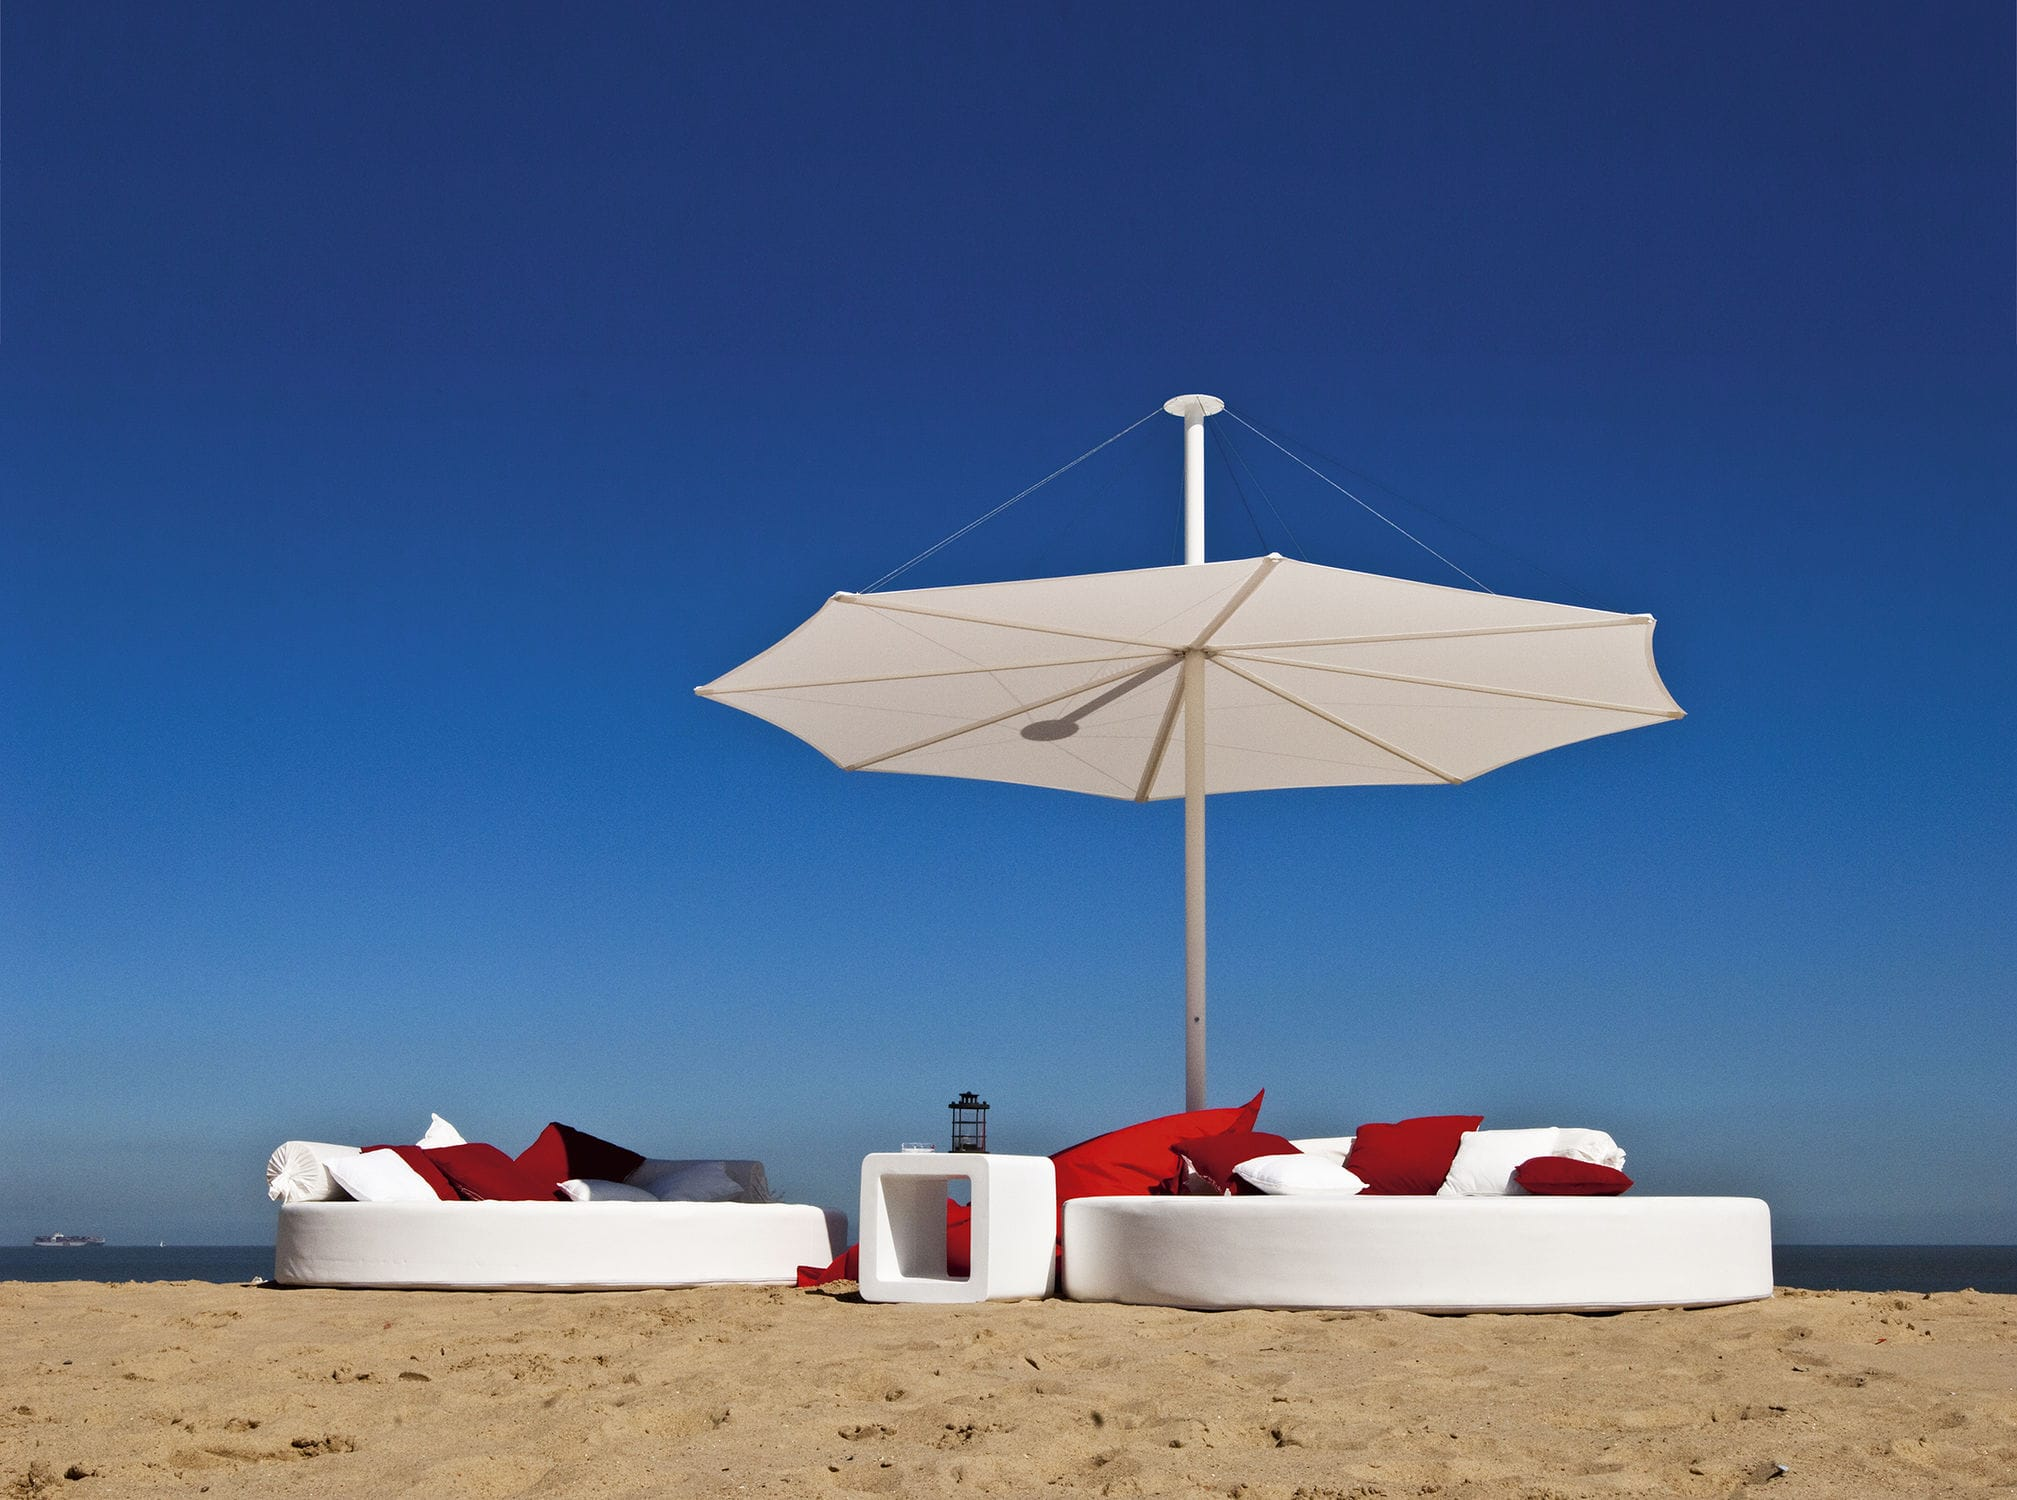 ... Commercial Patio Umbrella / Fabric SOLIS Symo Parasols ...